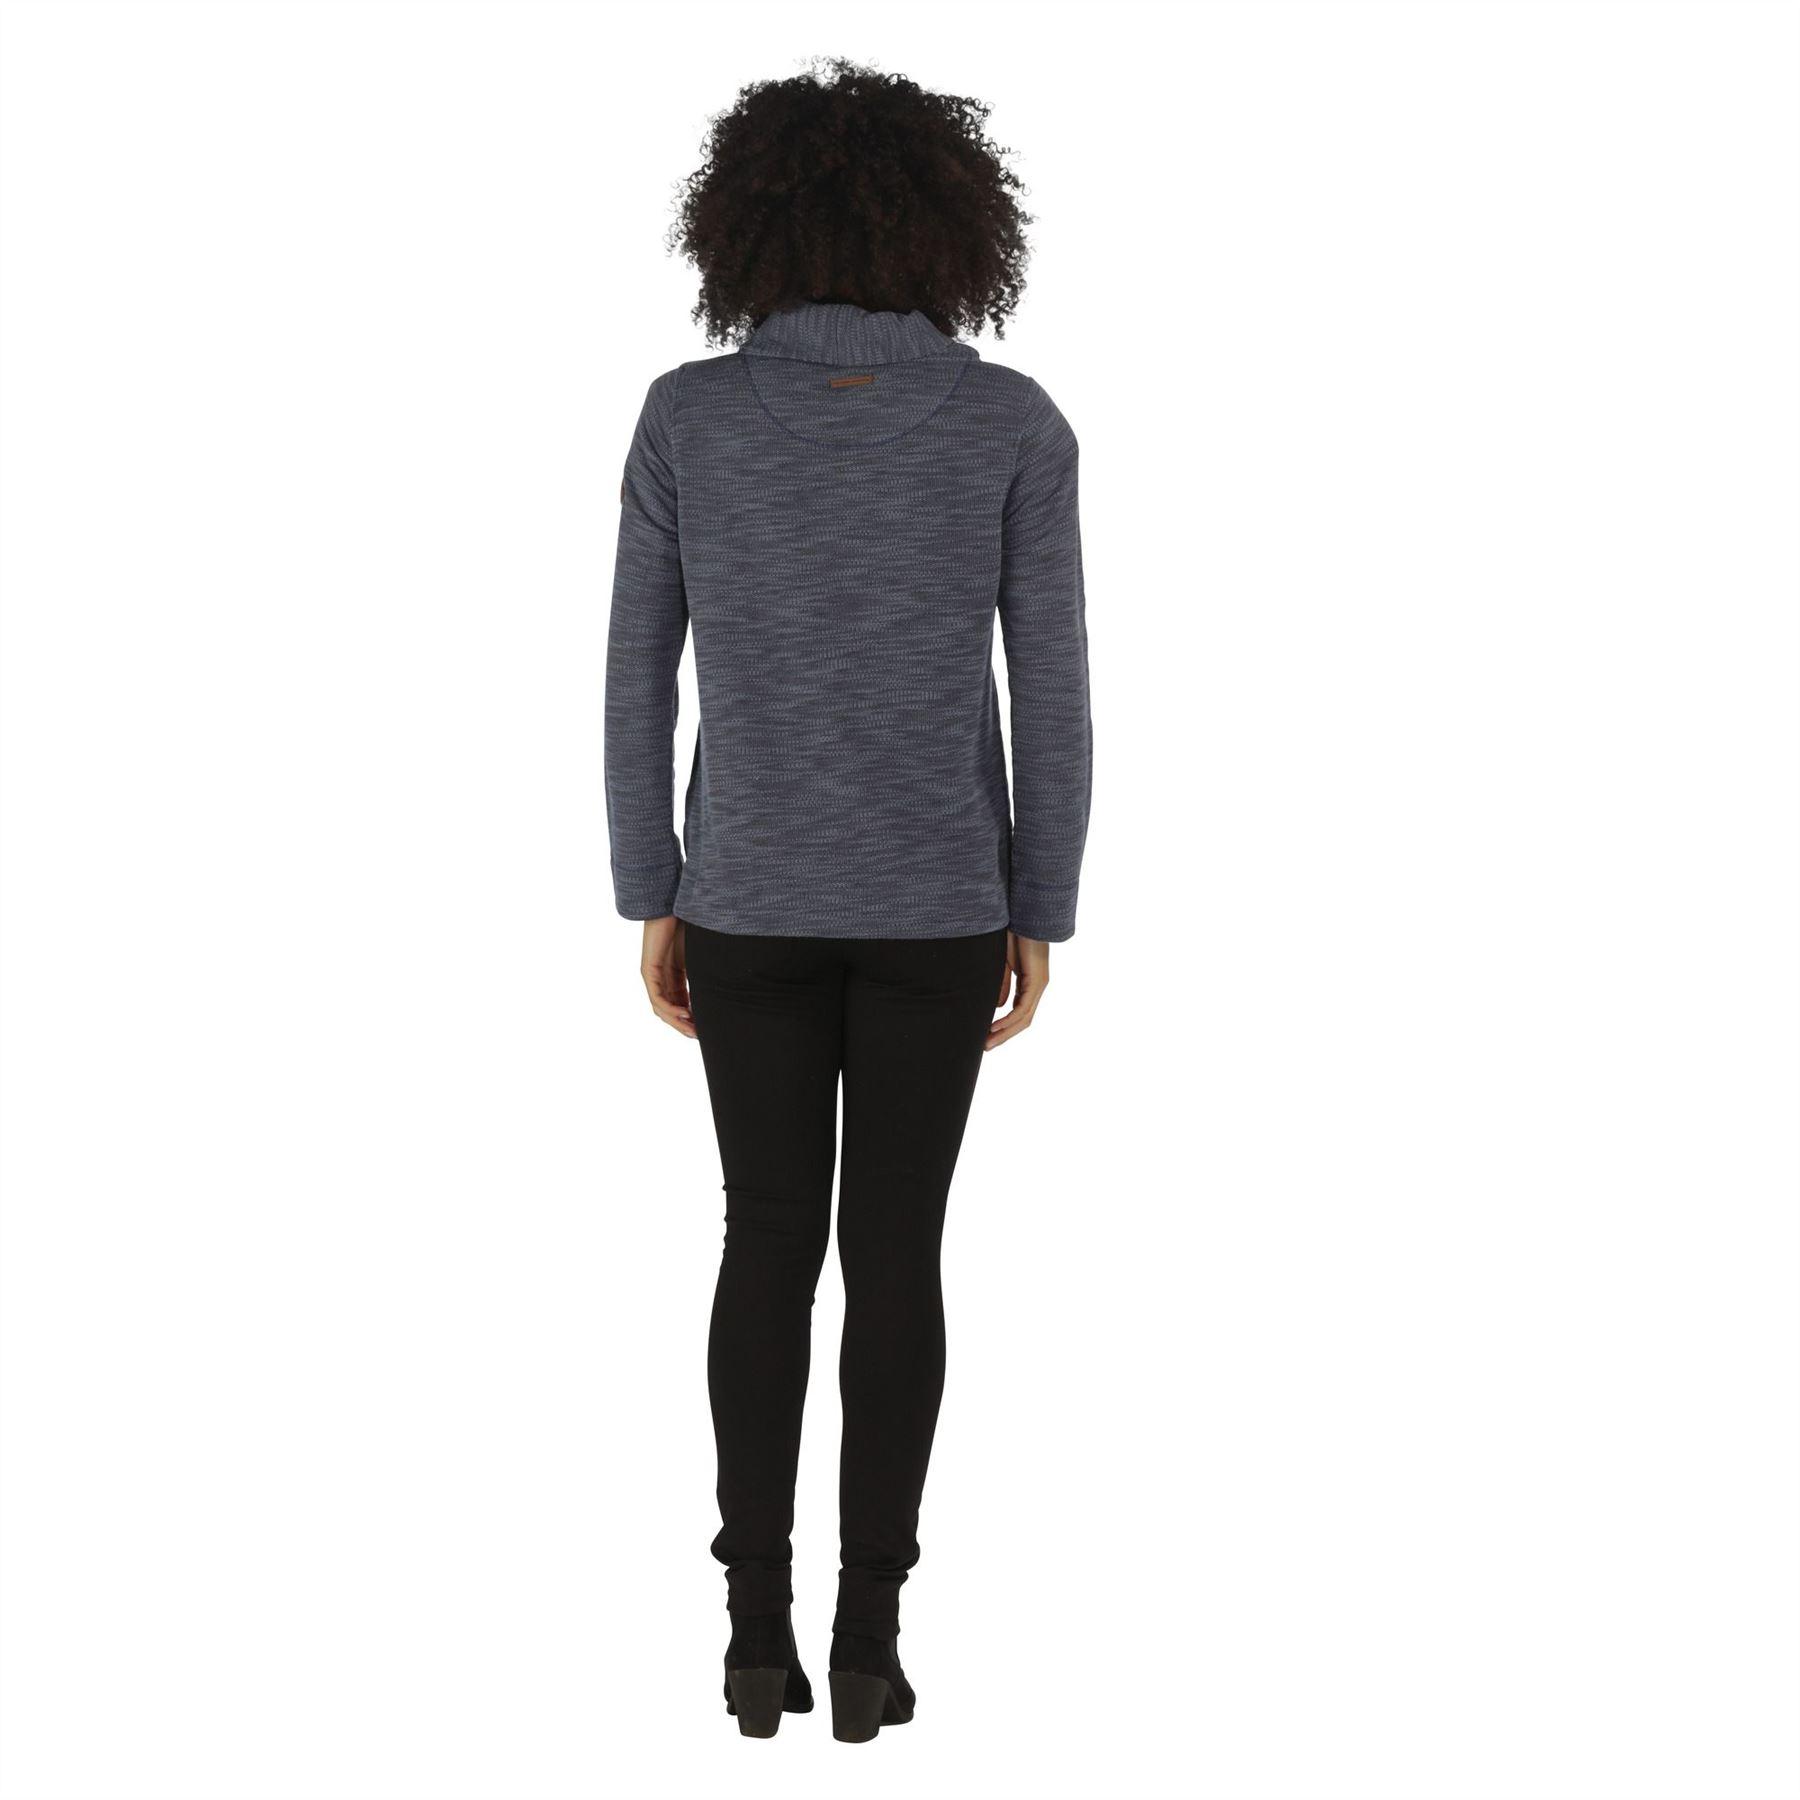 Regatta-Ceanna-Cowl-Neck-Soft-Fleece-Pull-Over-Jumper-Sweater-Top-RWA276 thumbnail 3